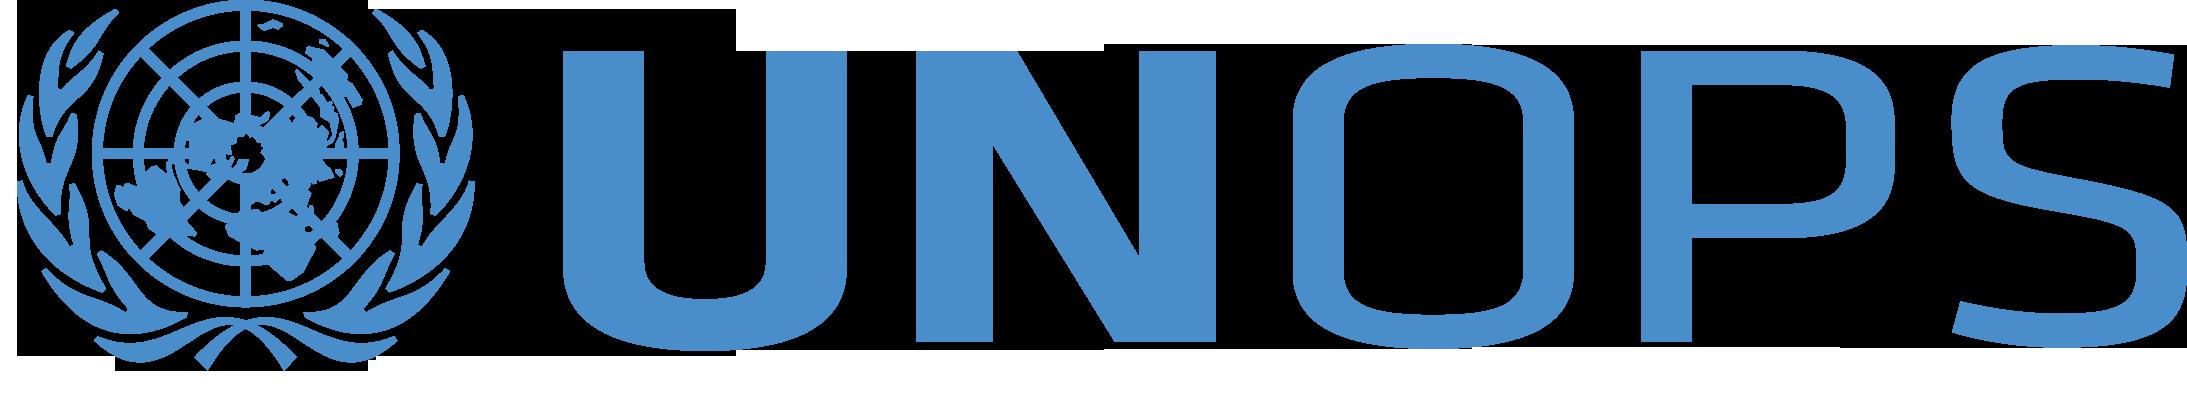 unct_kh_unops_logo_2016.png